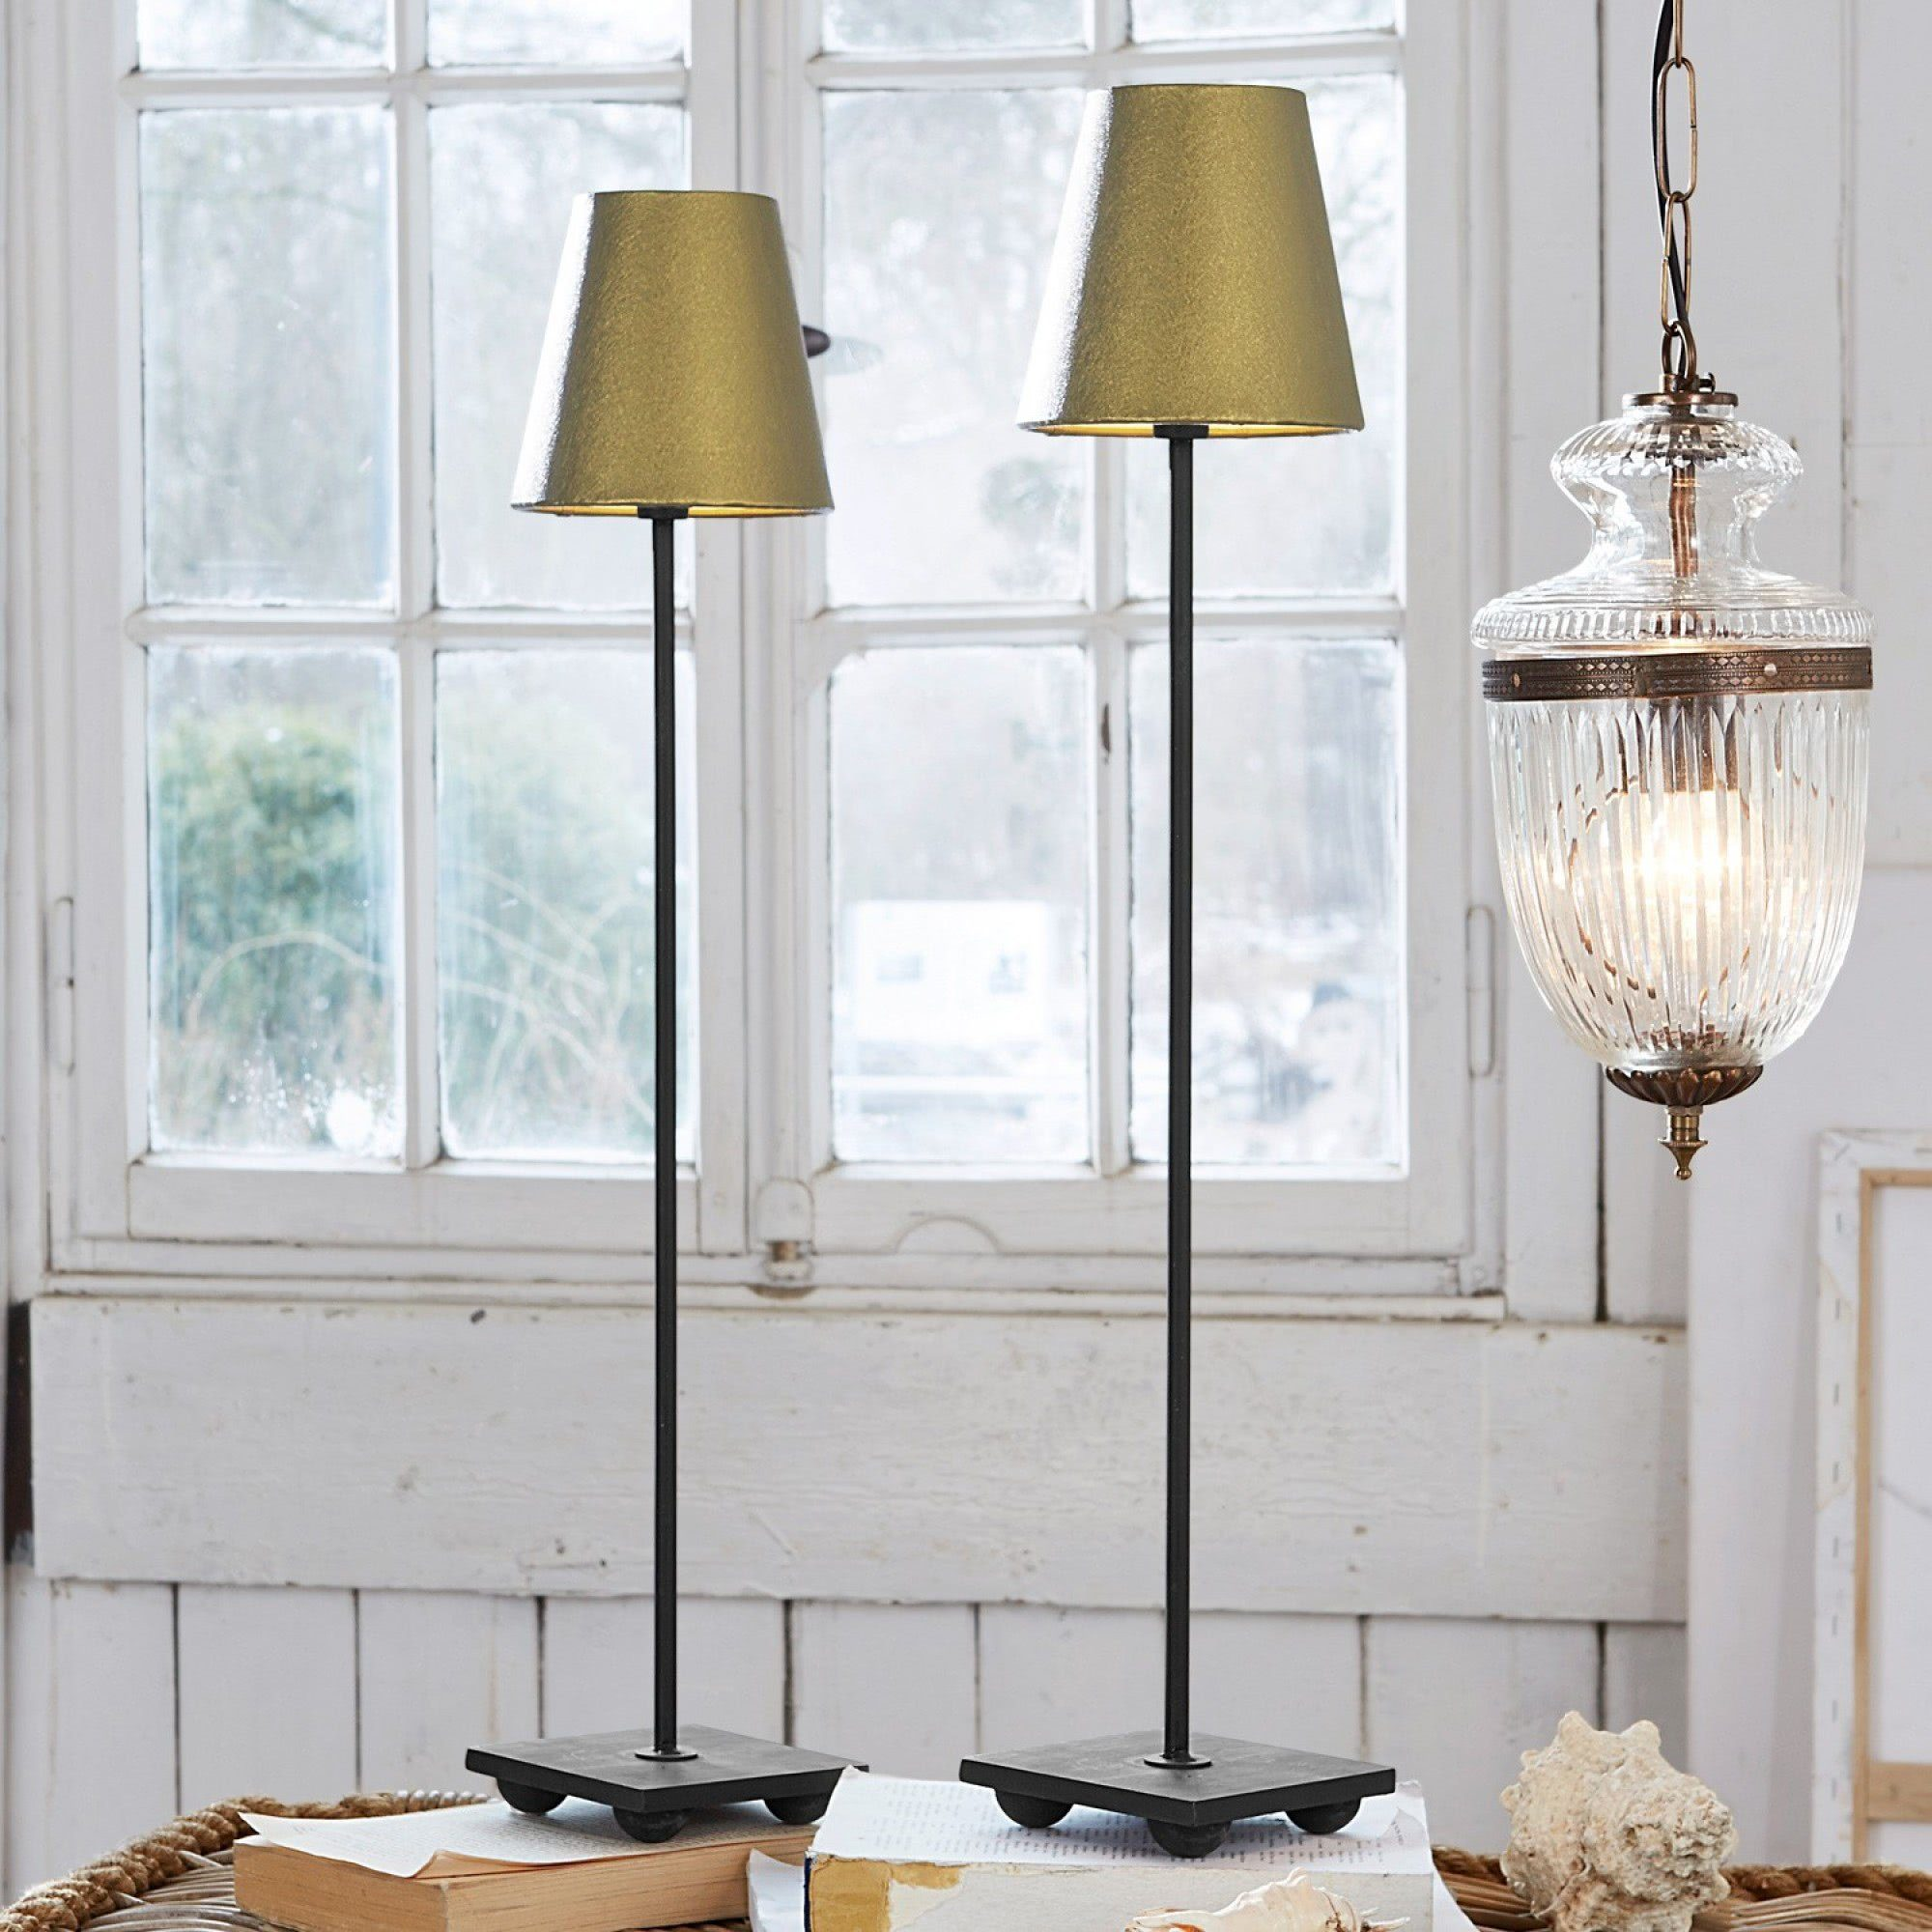 Loberon Tischlampe 2er Packung »Filia«